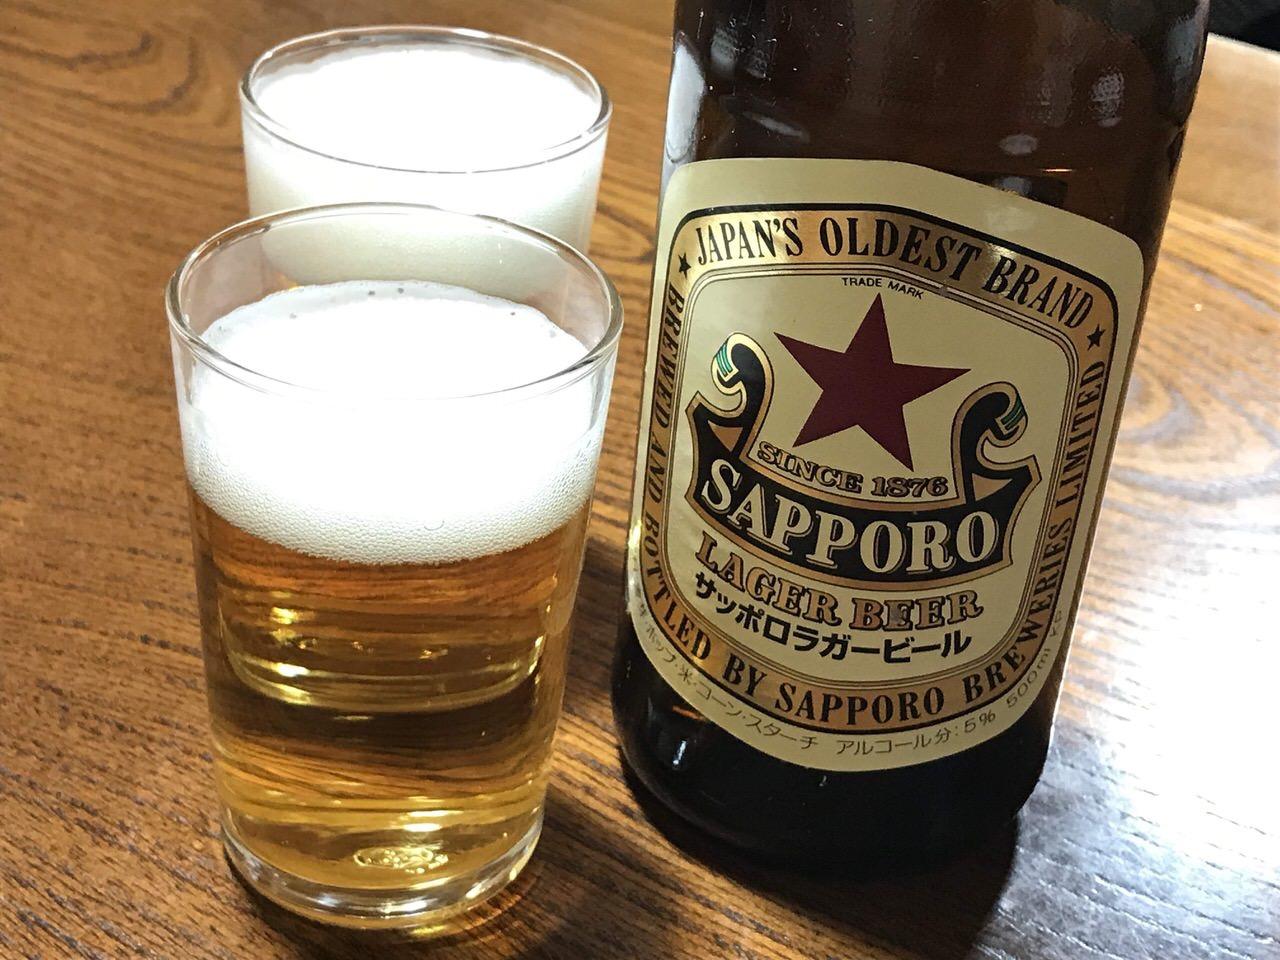 小政寿司 魚津 赤星 ビール大瓶